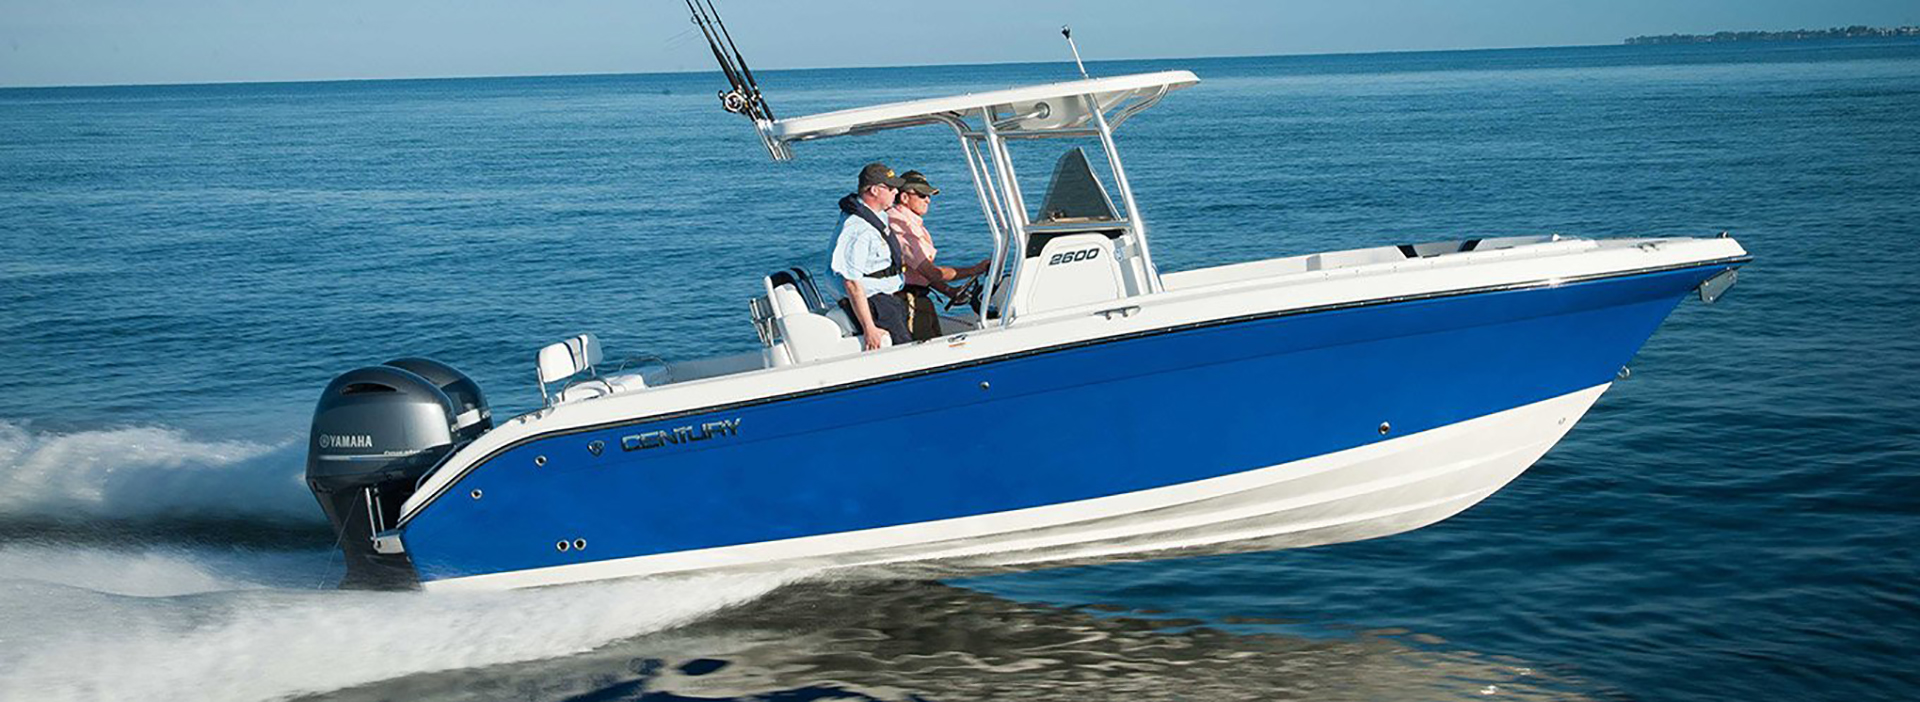 Century Boat Gregg Orr Marine